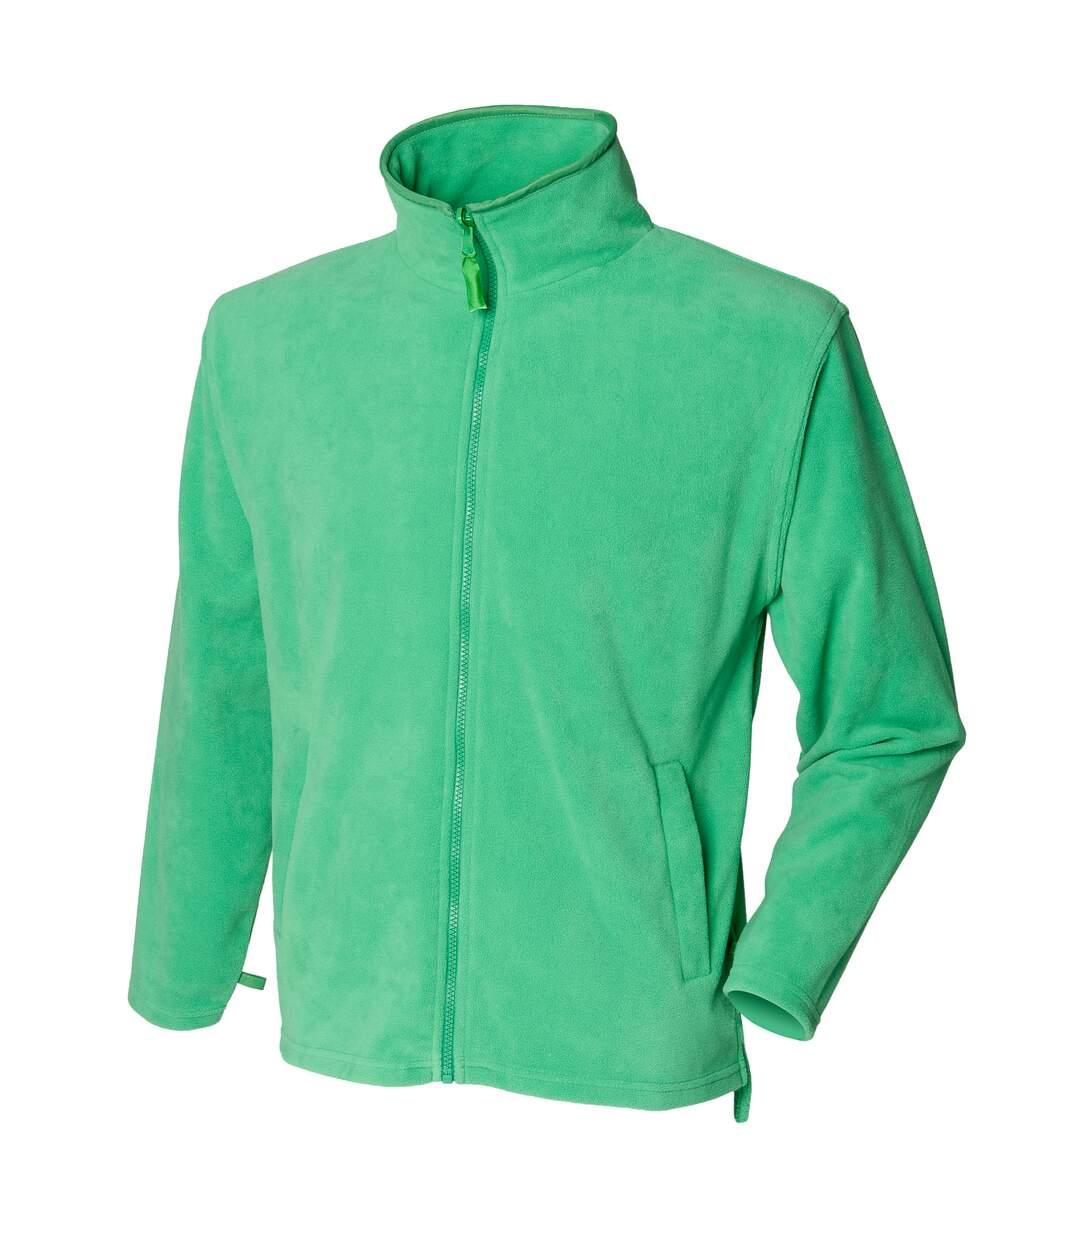 Henbury Mens Microfleece Anti-Pill Jacket (Kelly) - UTRW678